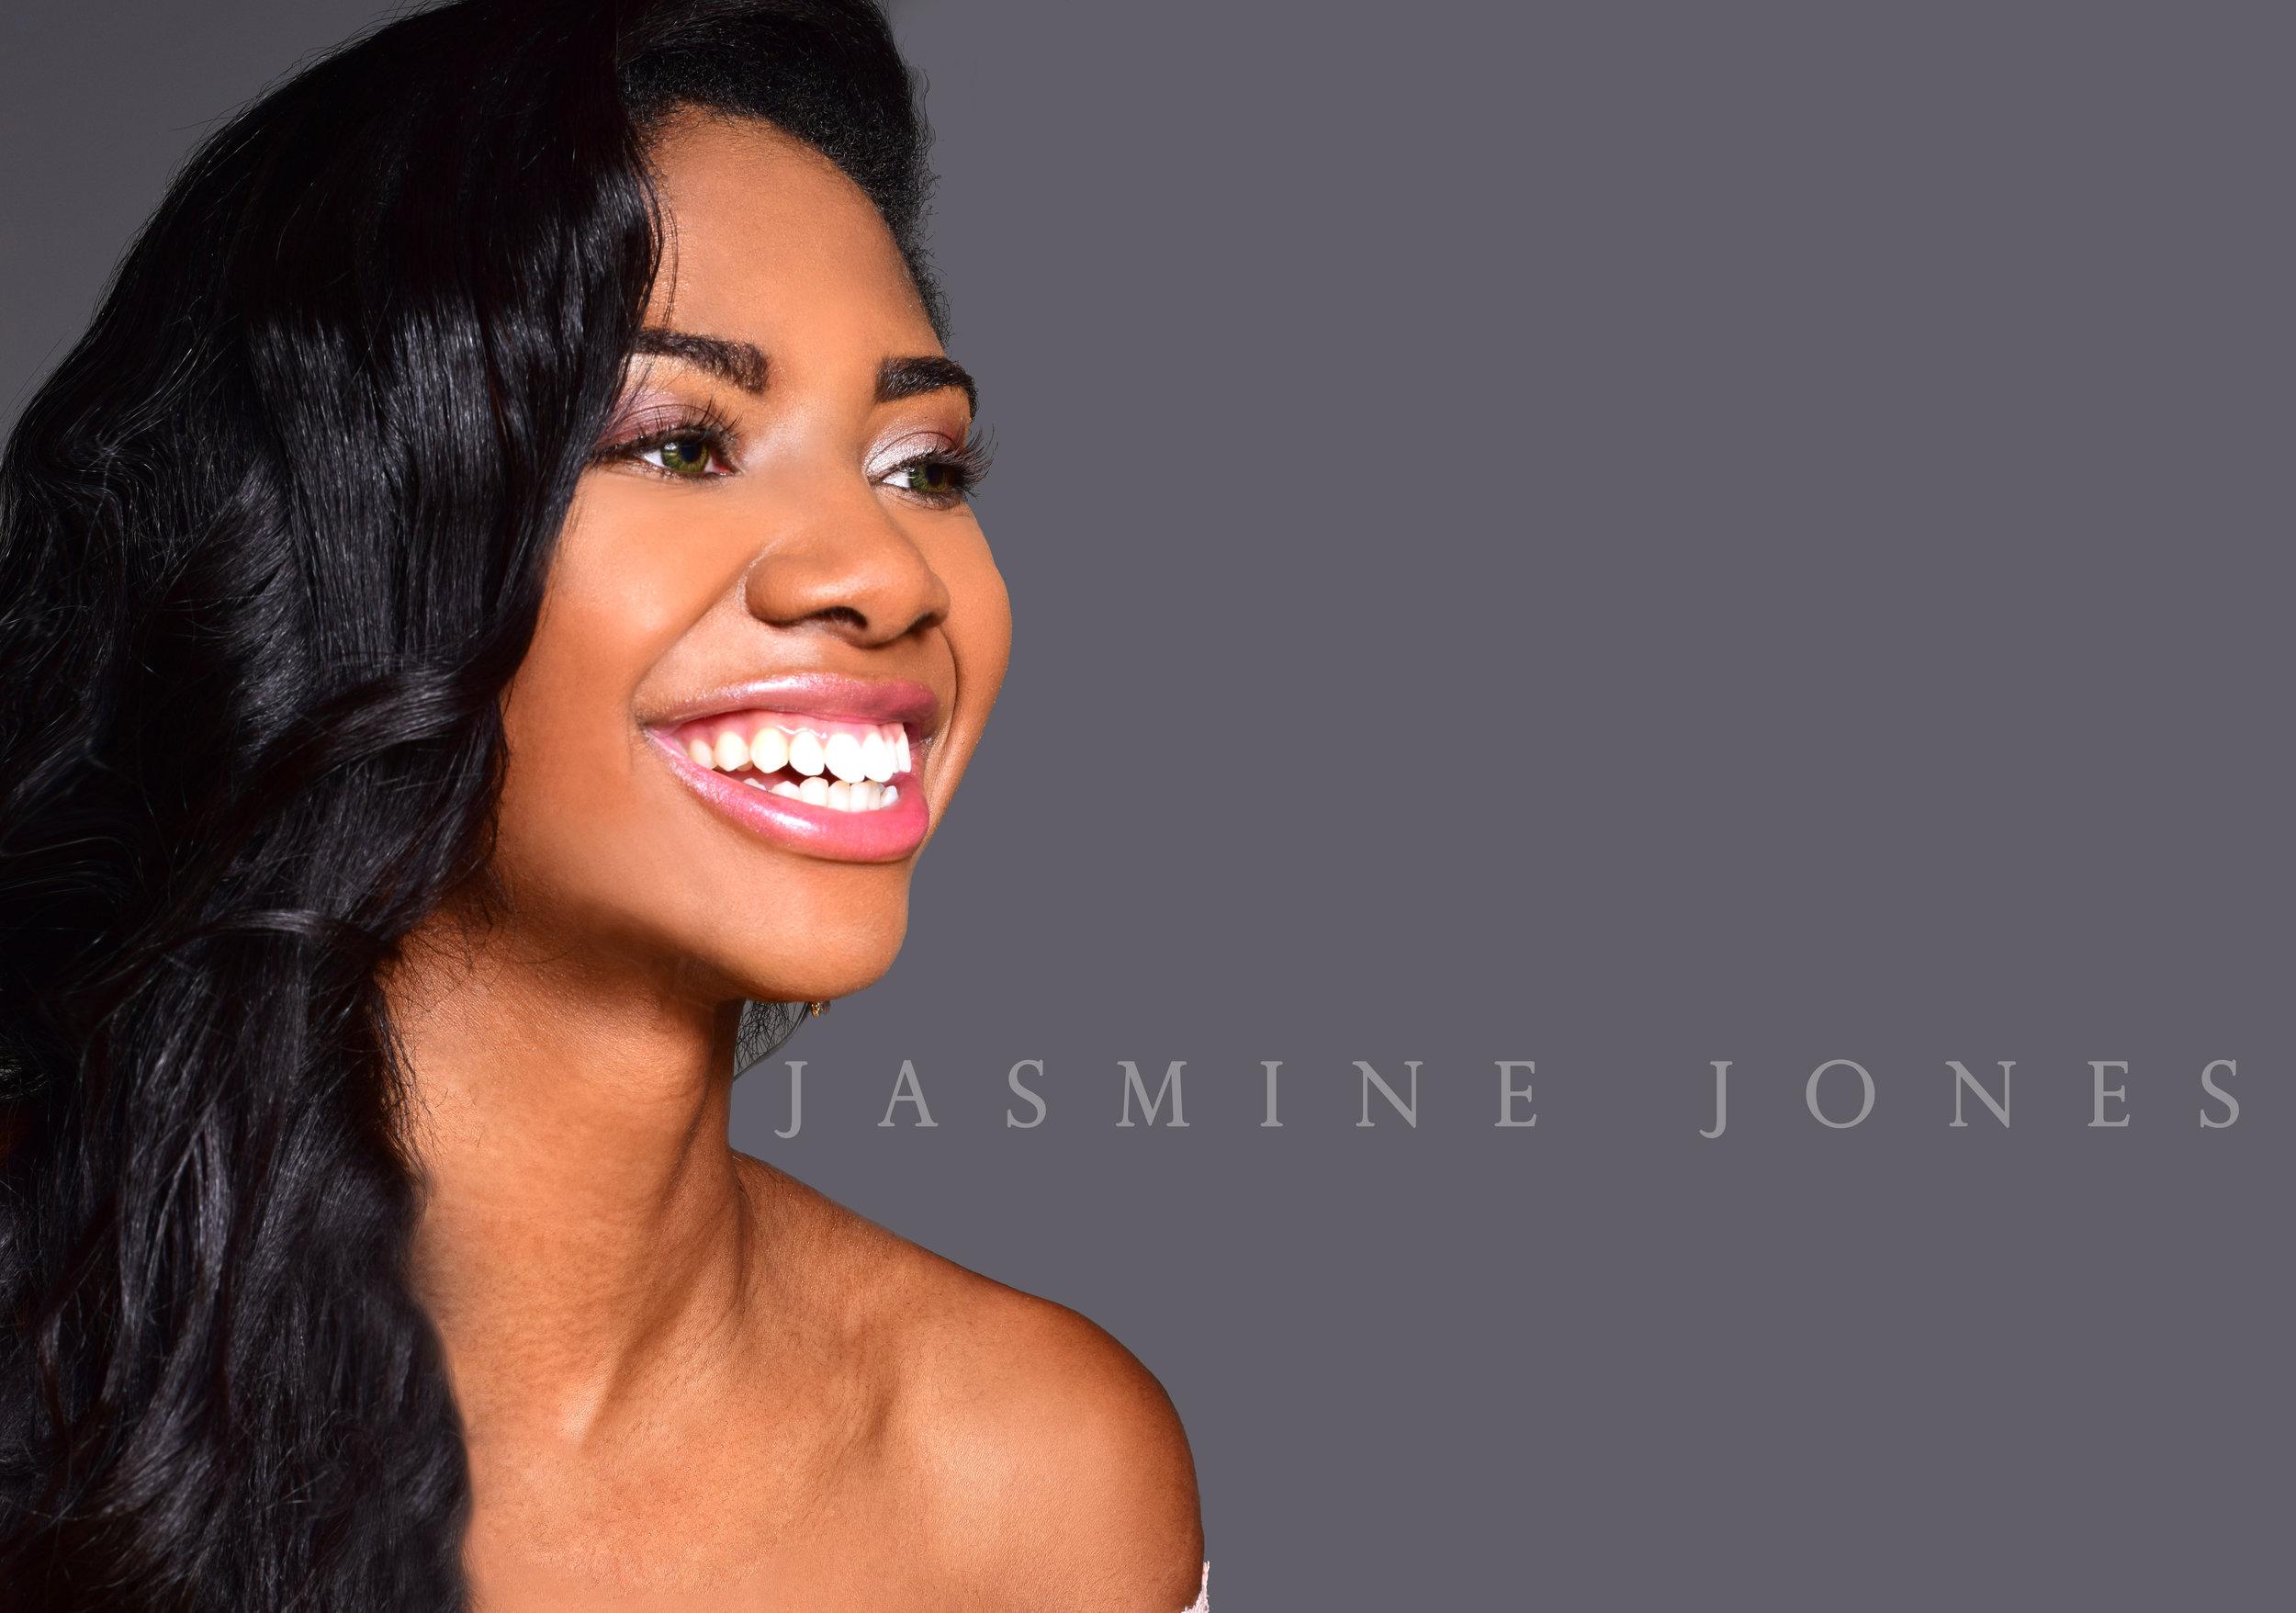 Jasmine Jones 2.jpg